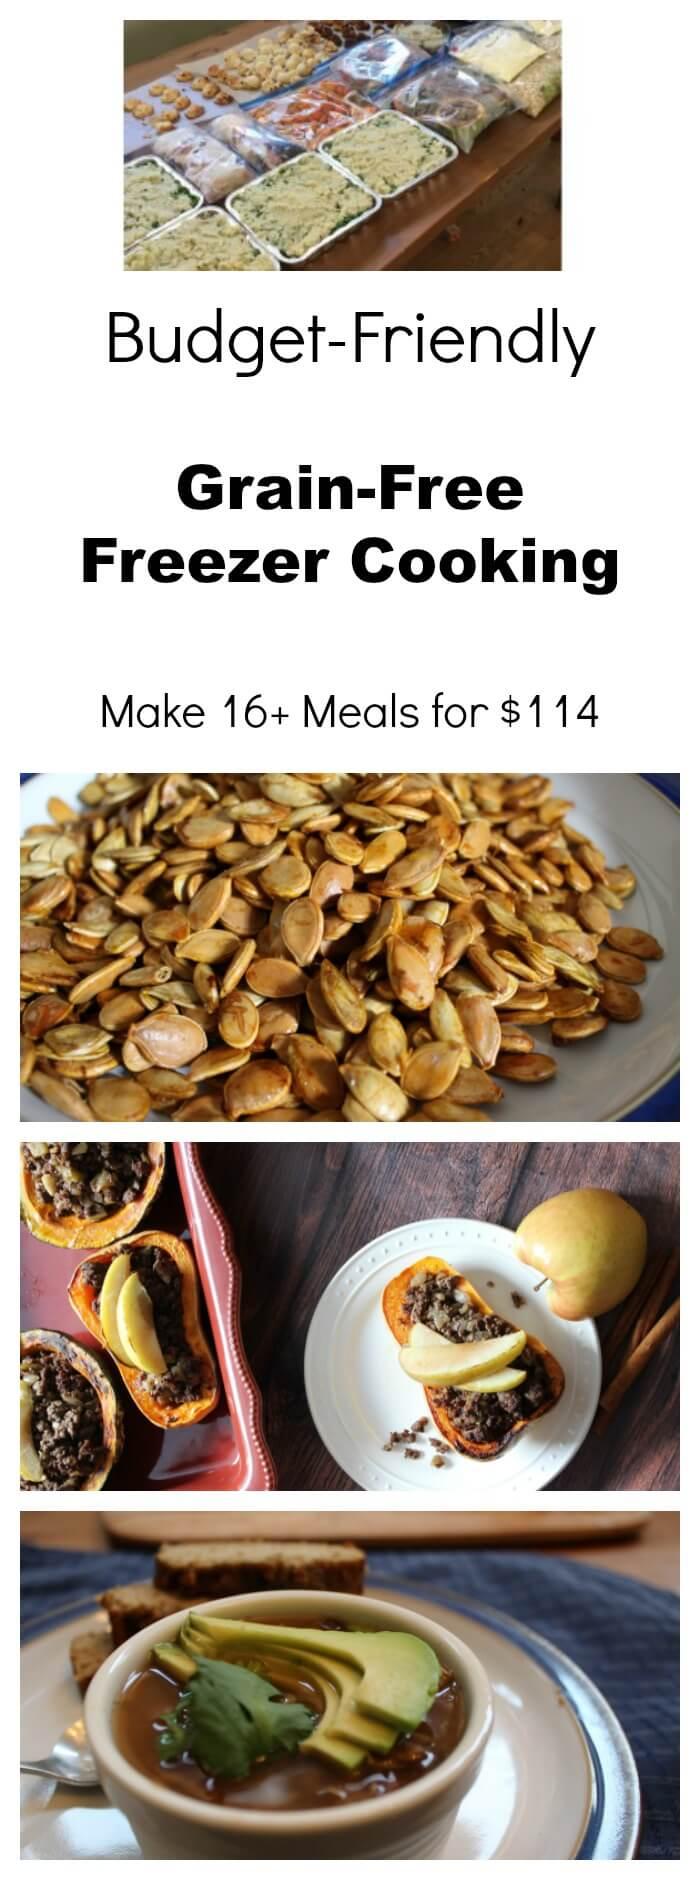 budget-friendly-freezer-cooking